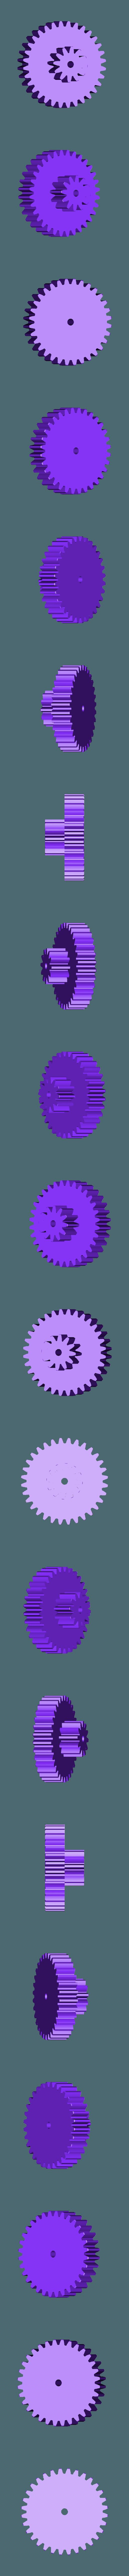 gear3.stl Download free STL file Universal GEARBOX • 3D print design, LetsPrintYT